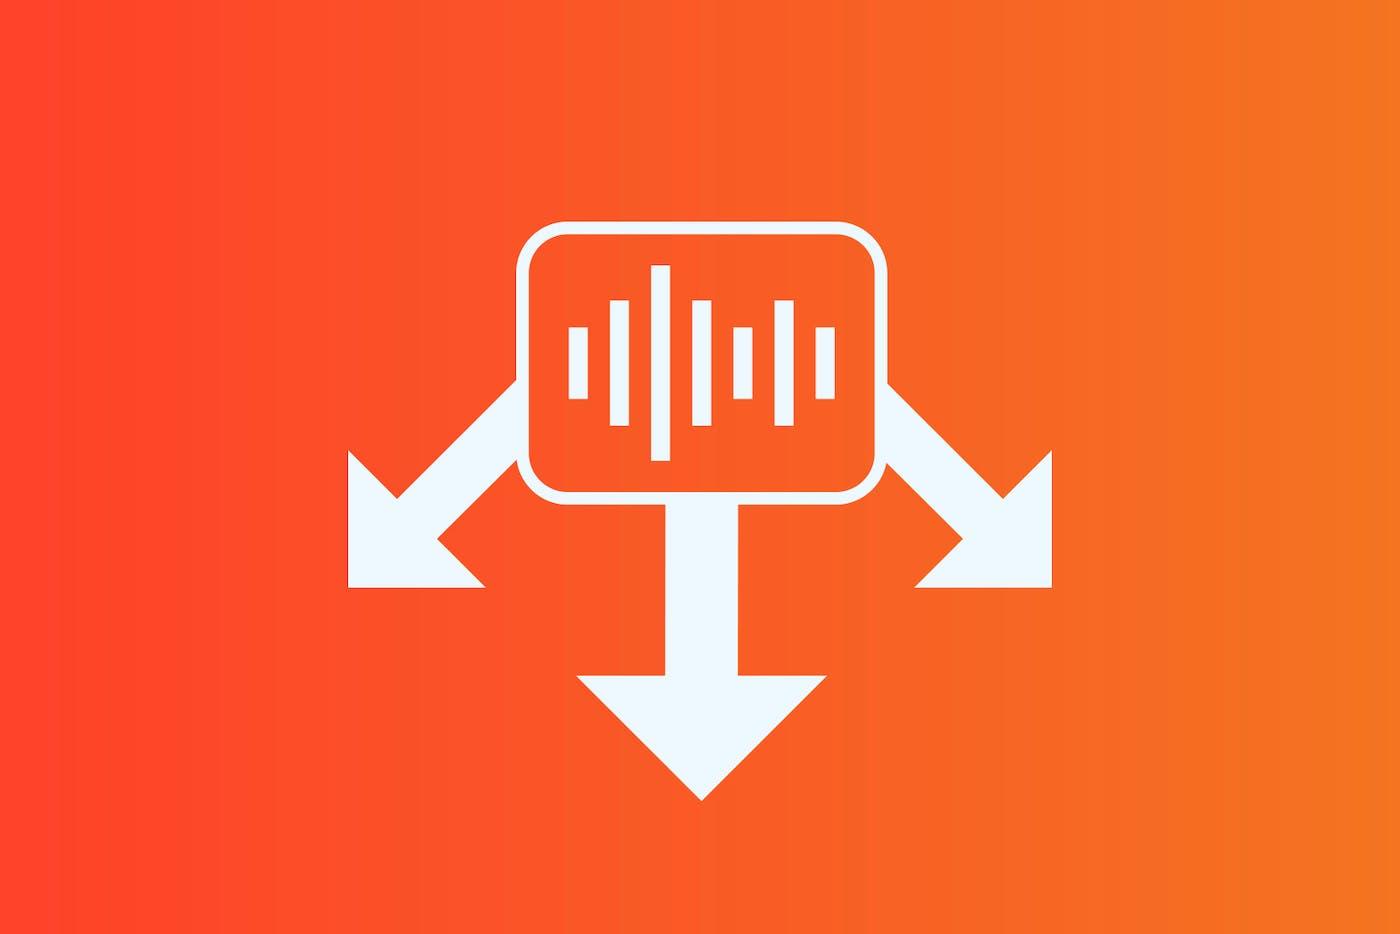 The technology behind Rhythmiq